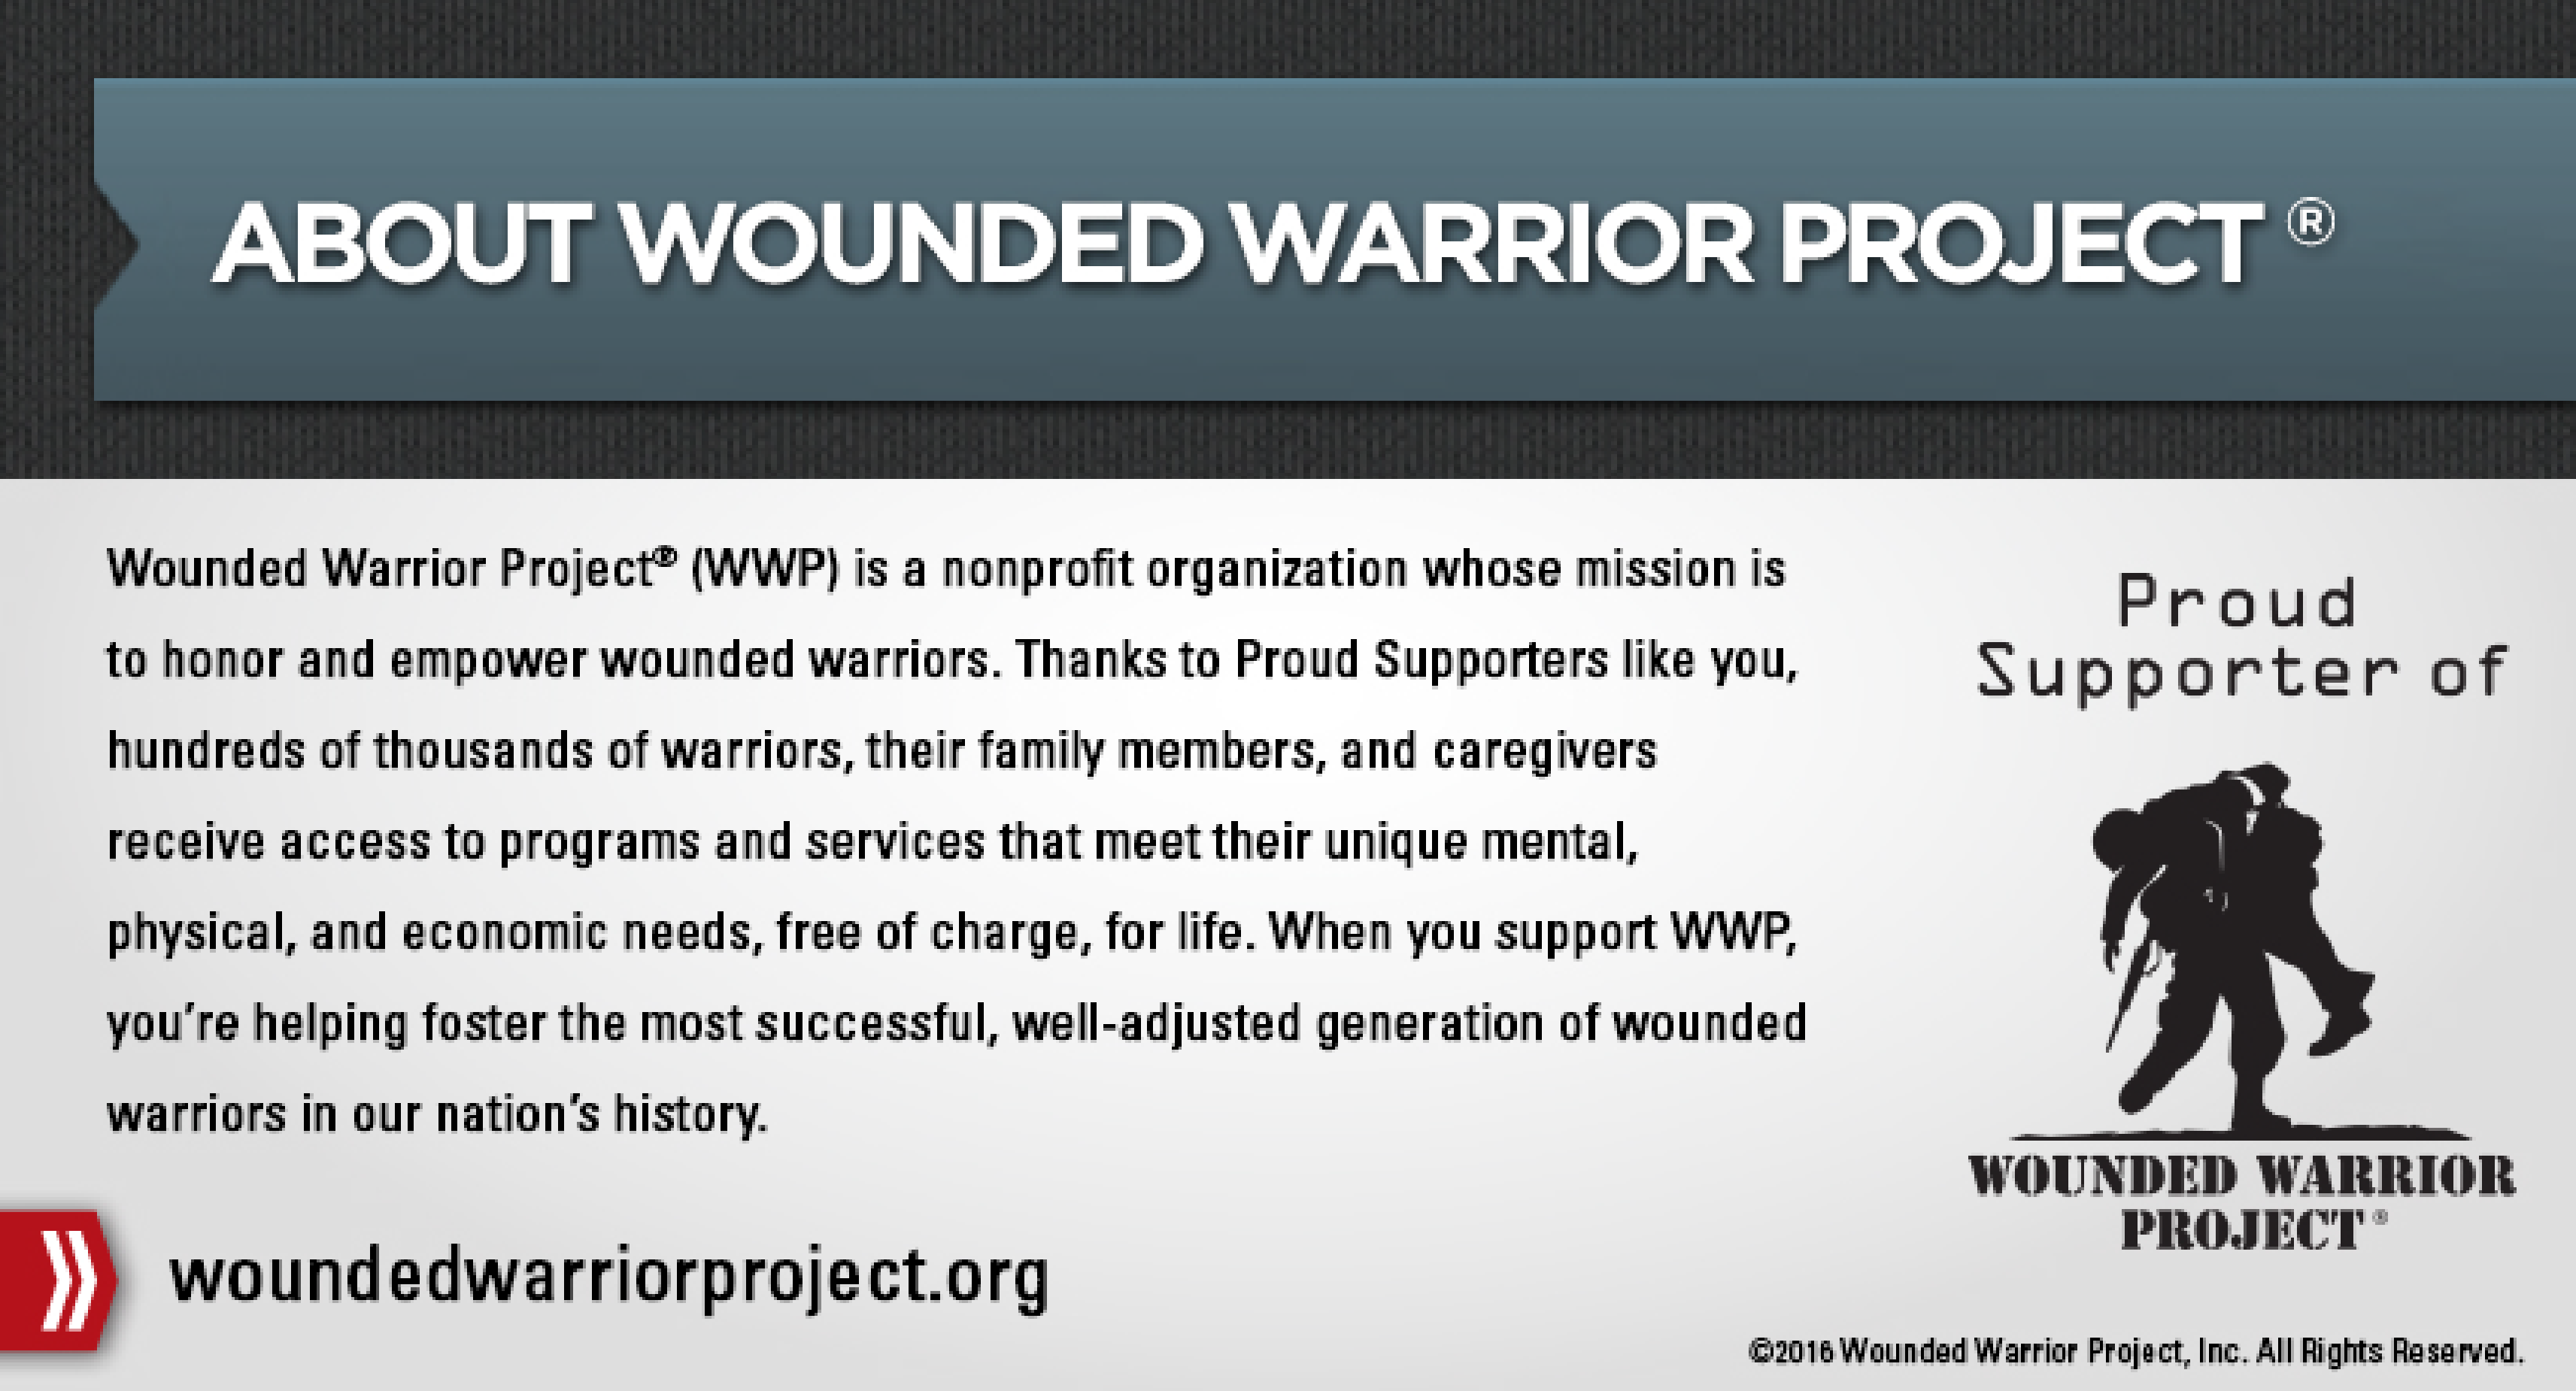 Wounded Warrior Description